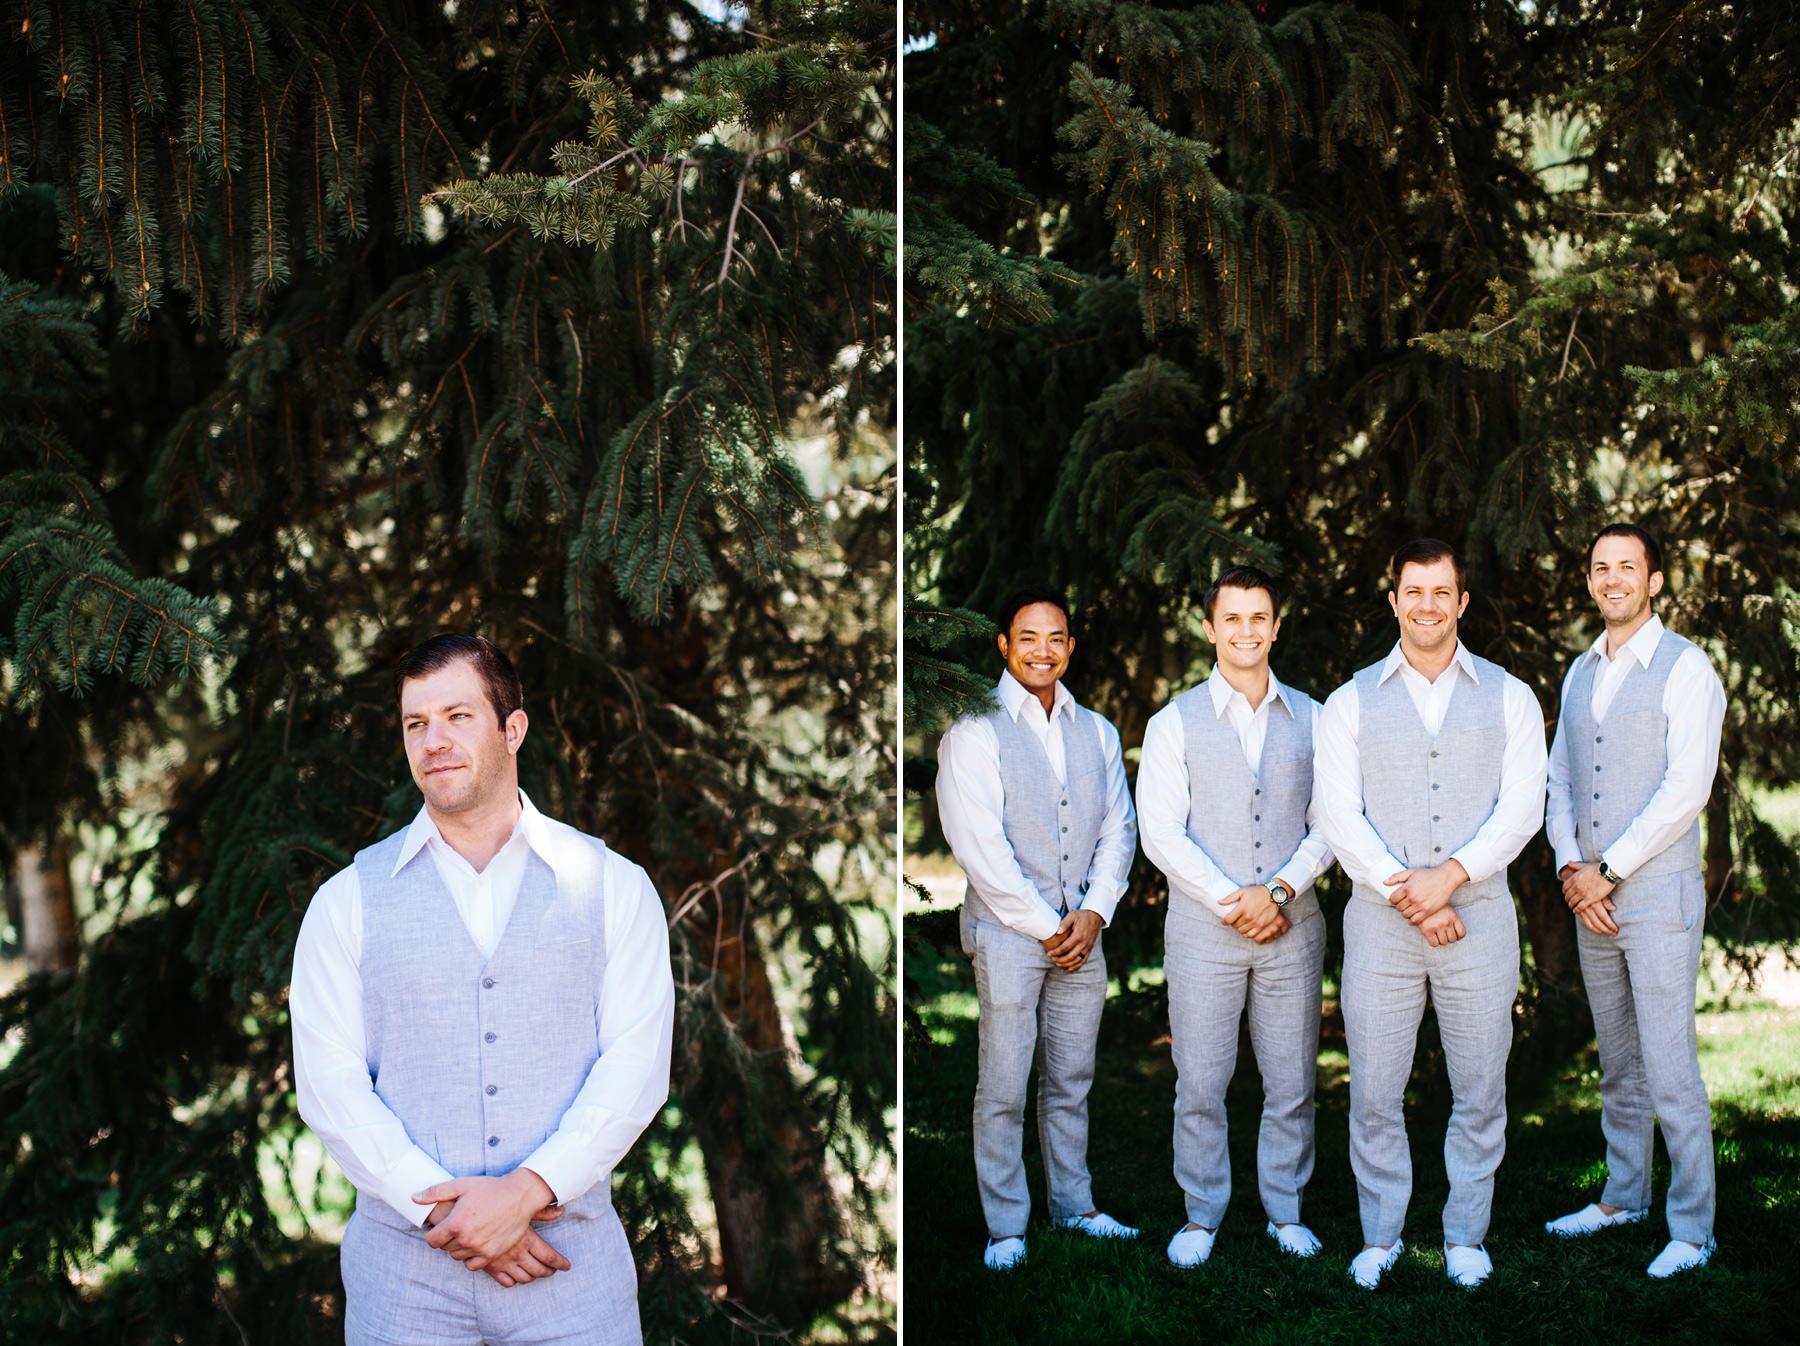 Vail Colorado Wedding Deck_ Kindling Wedding Photography12.JPG